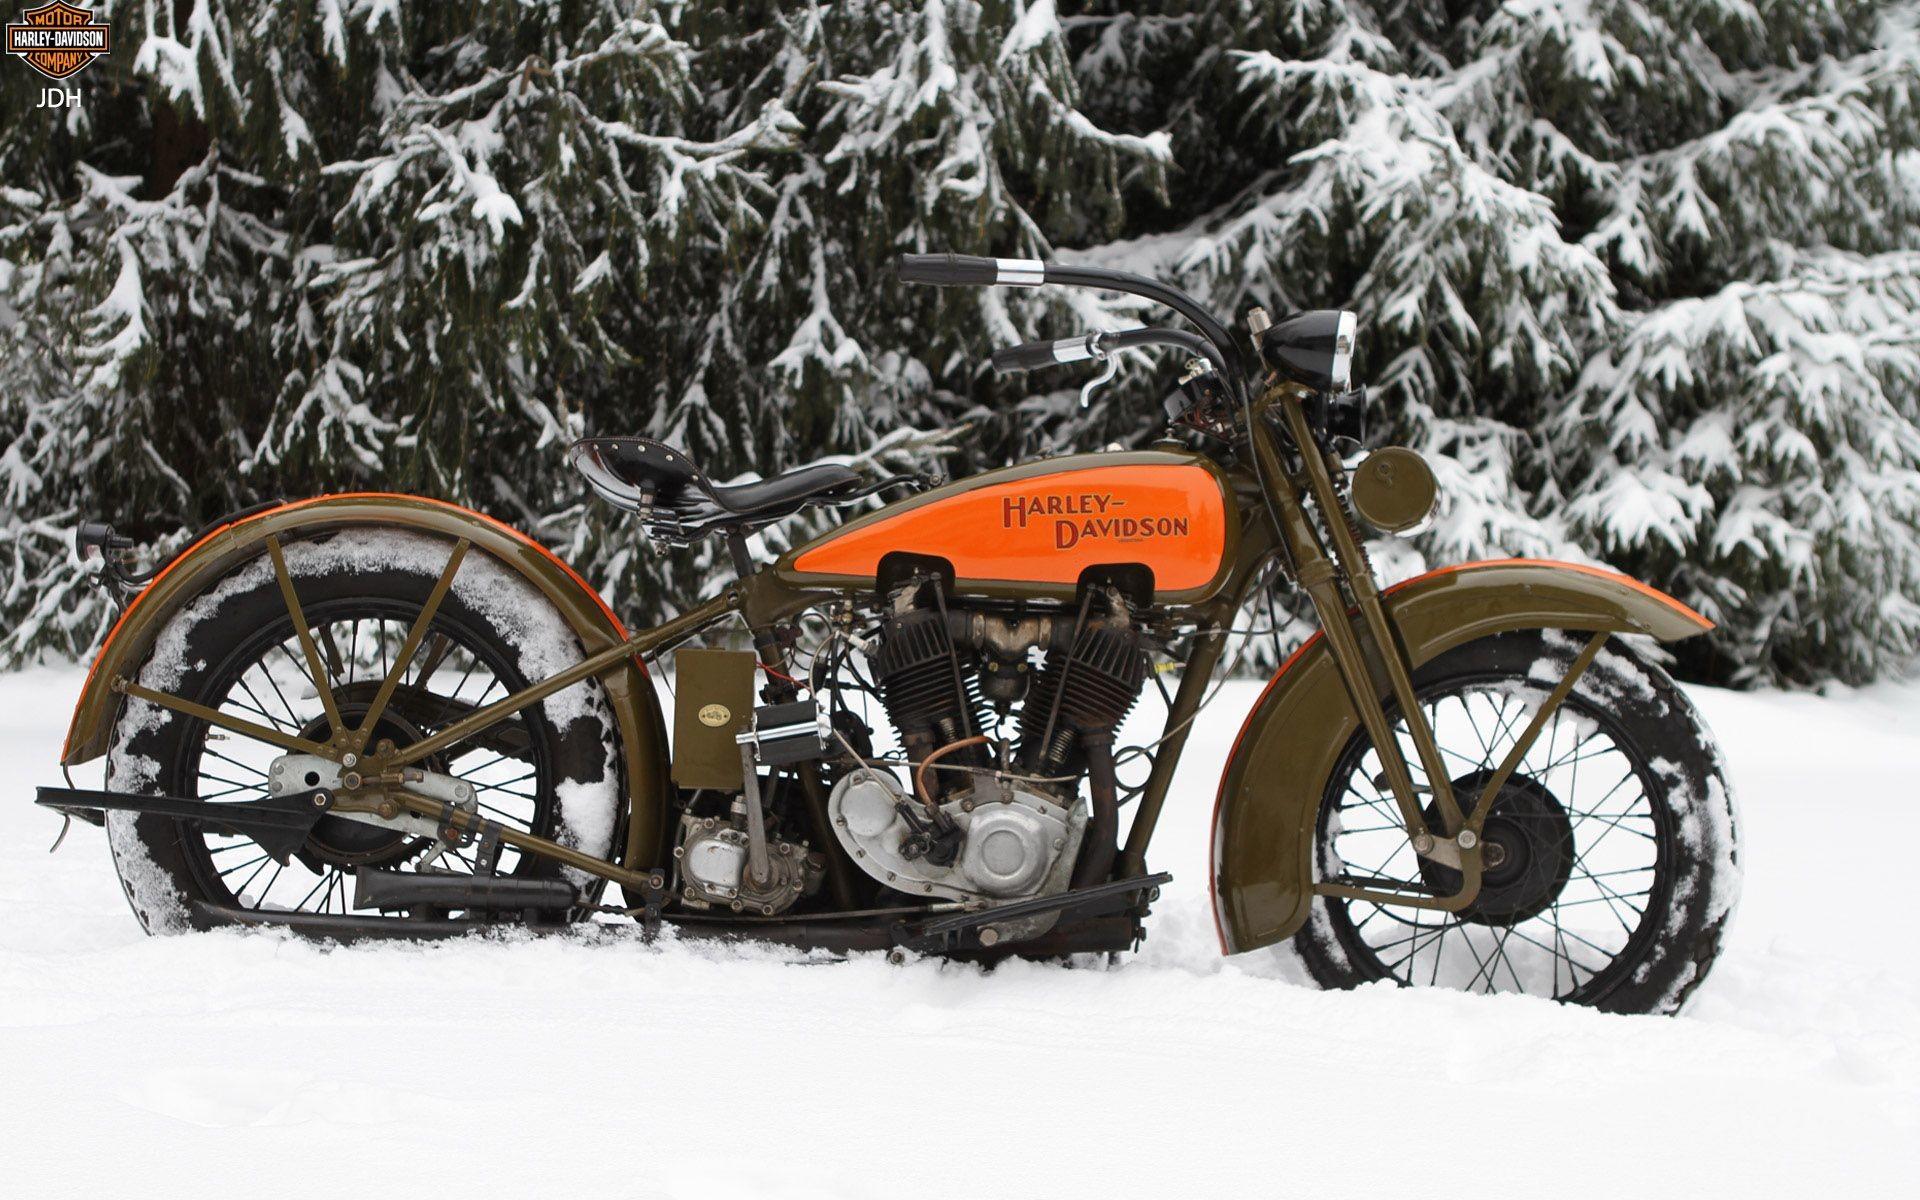 Res: 1920x1200, Harley Davidson JDH Retro Motorcycle, Classic Motorcycle, Vintage  Motorcycles, Cars And Motorcycles,